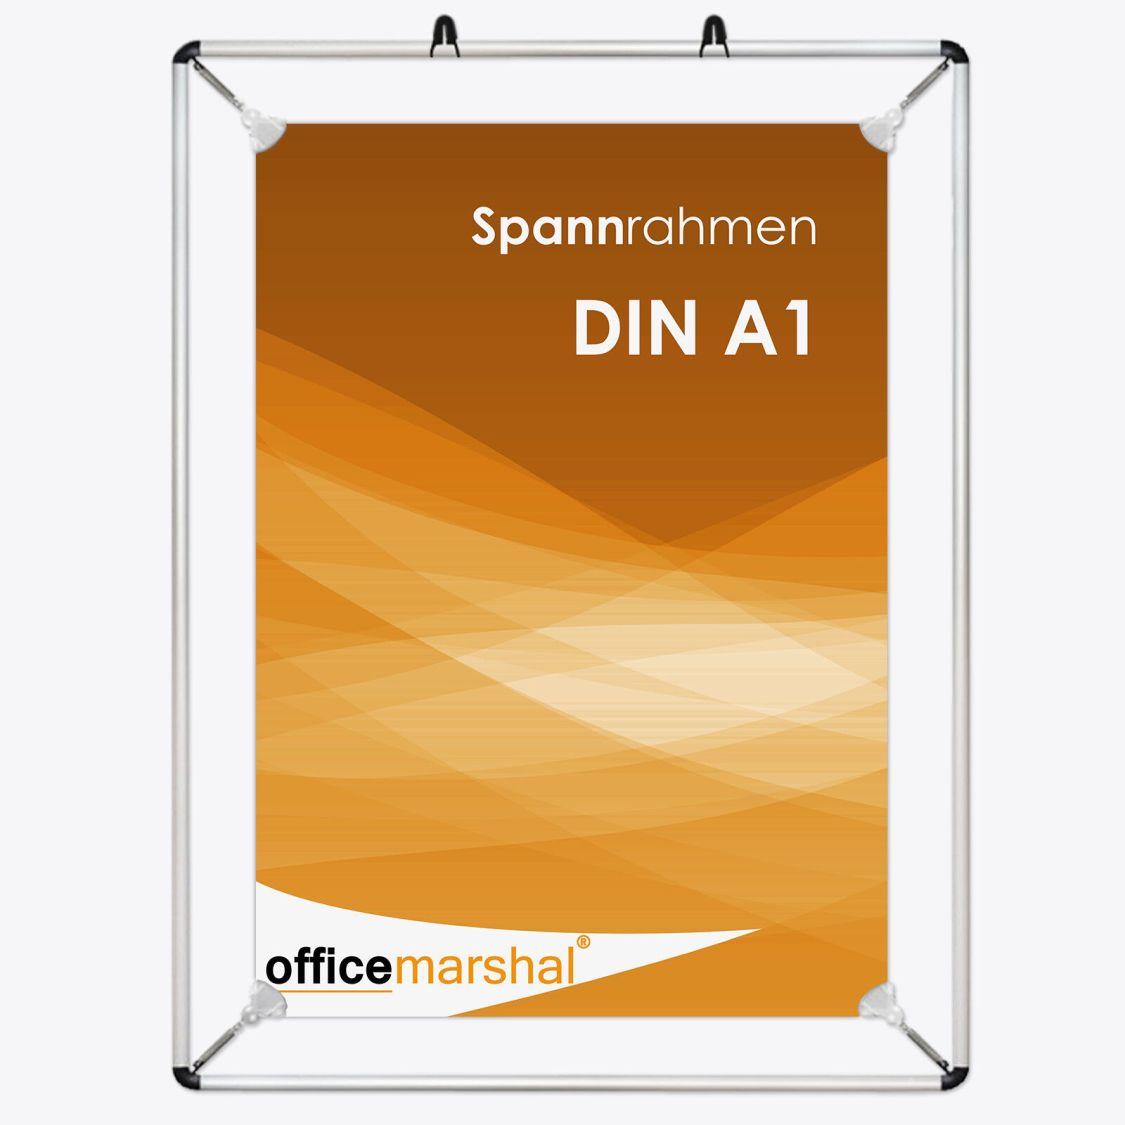 1 x Spannrahmen Plakatrahmen Werberahmen Posterhalter Bilderrahmen Größe DIN A1